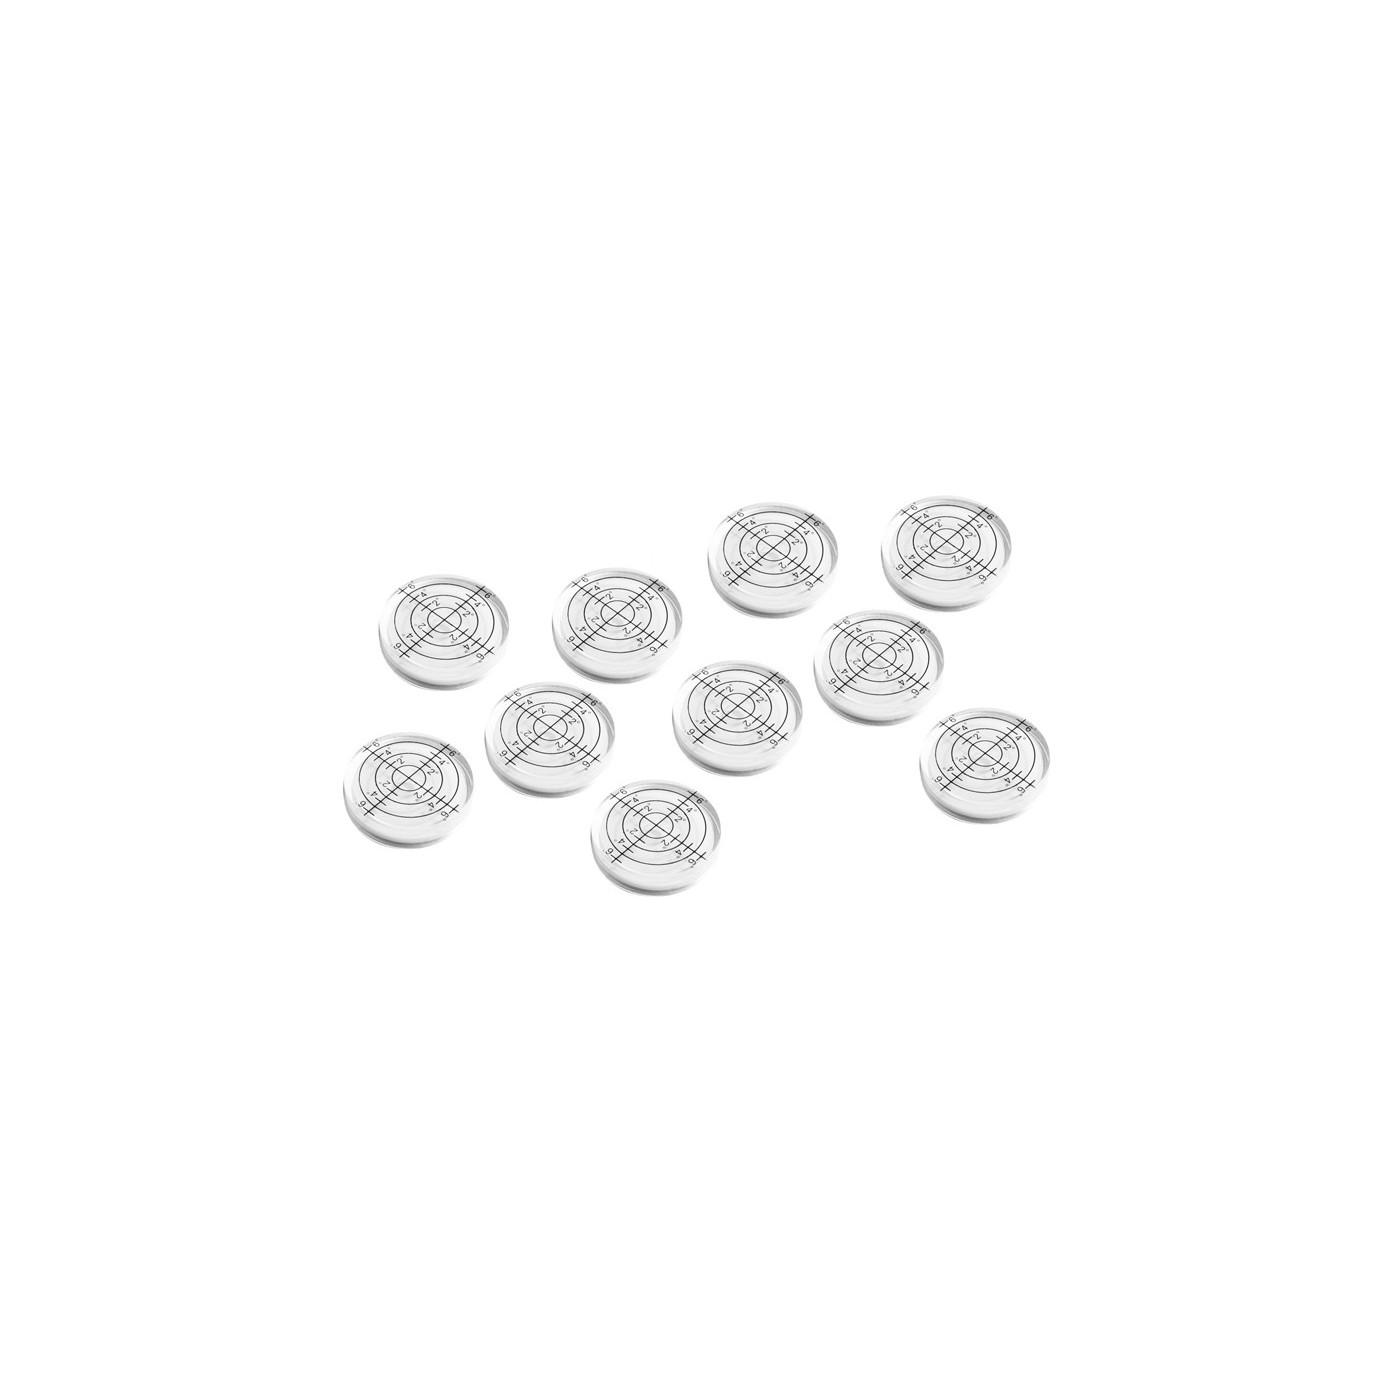 Set van 10 ronde waterpasjes (32x7 mm, wit)